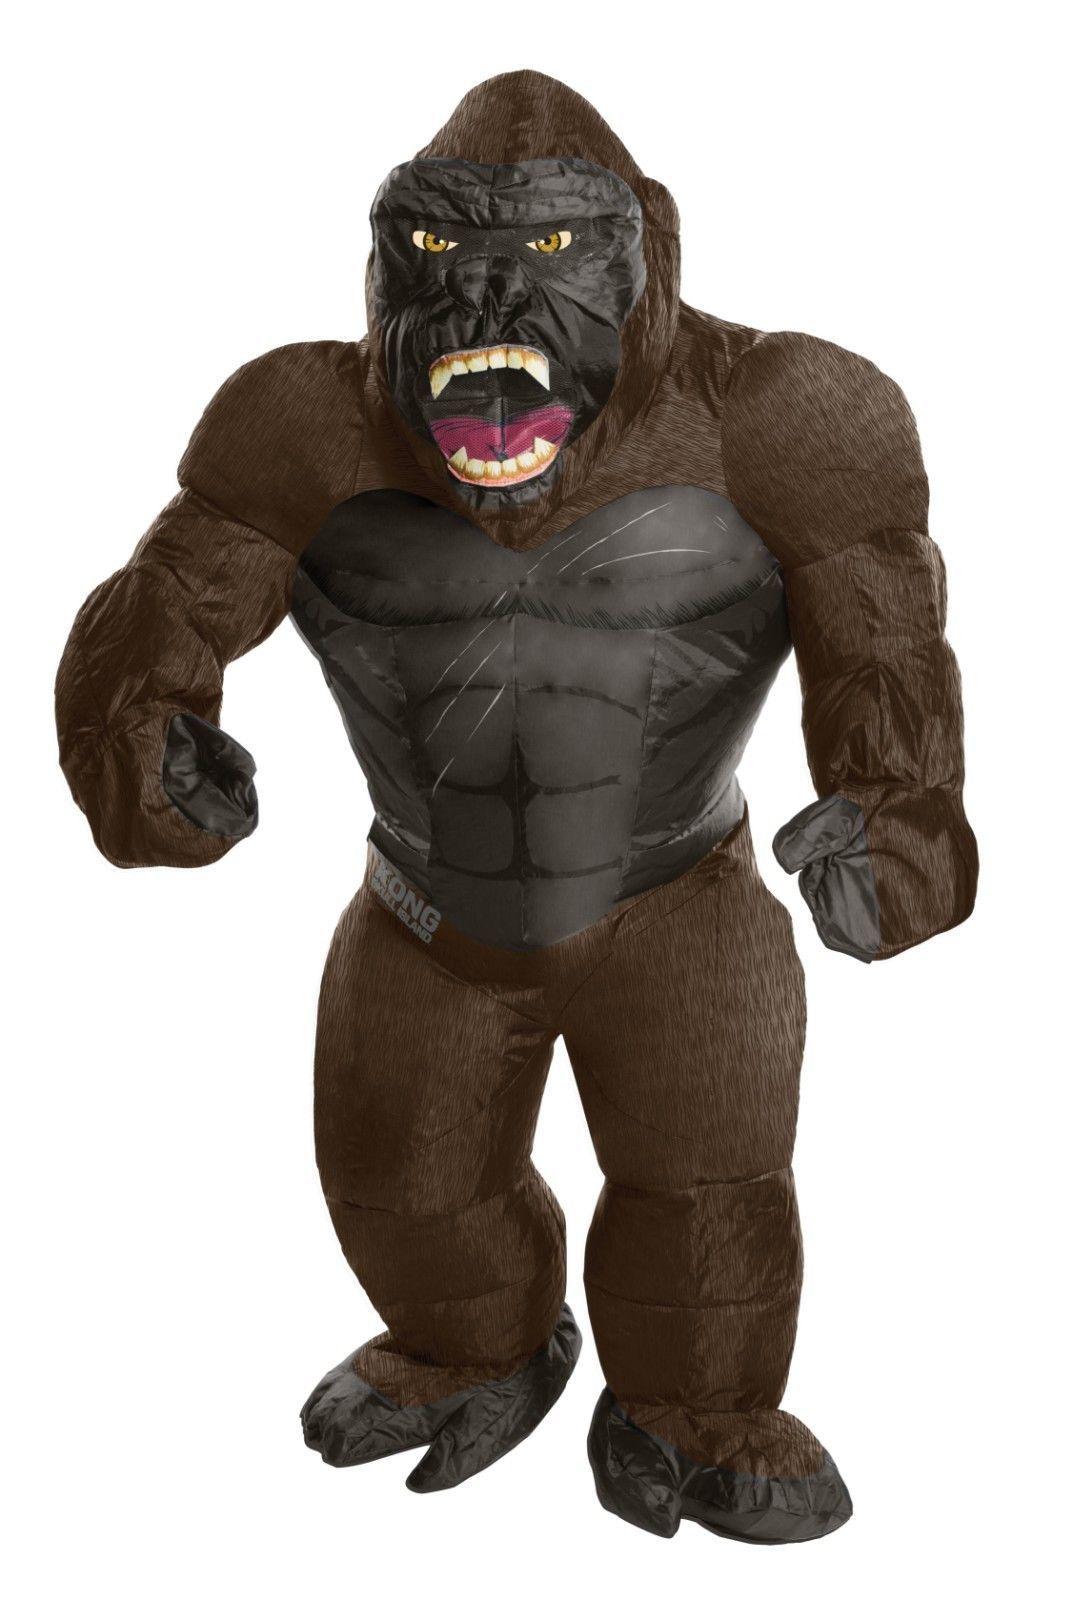 Rubies King Kong Hinchable Gigante Gorila Animal Adulto Disfraz Halloween 820584